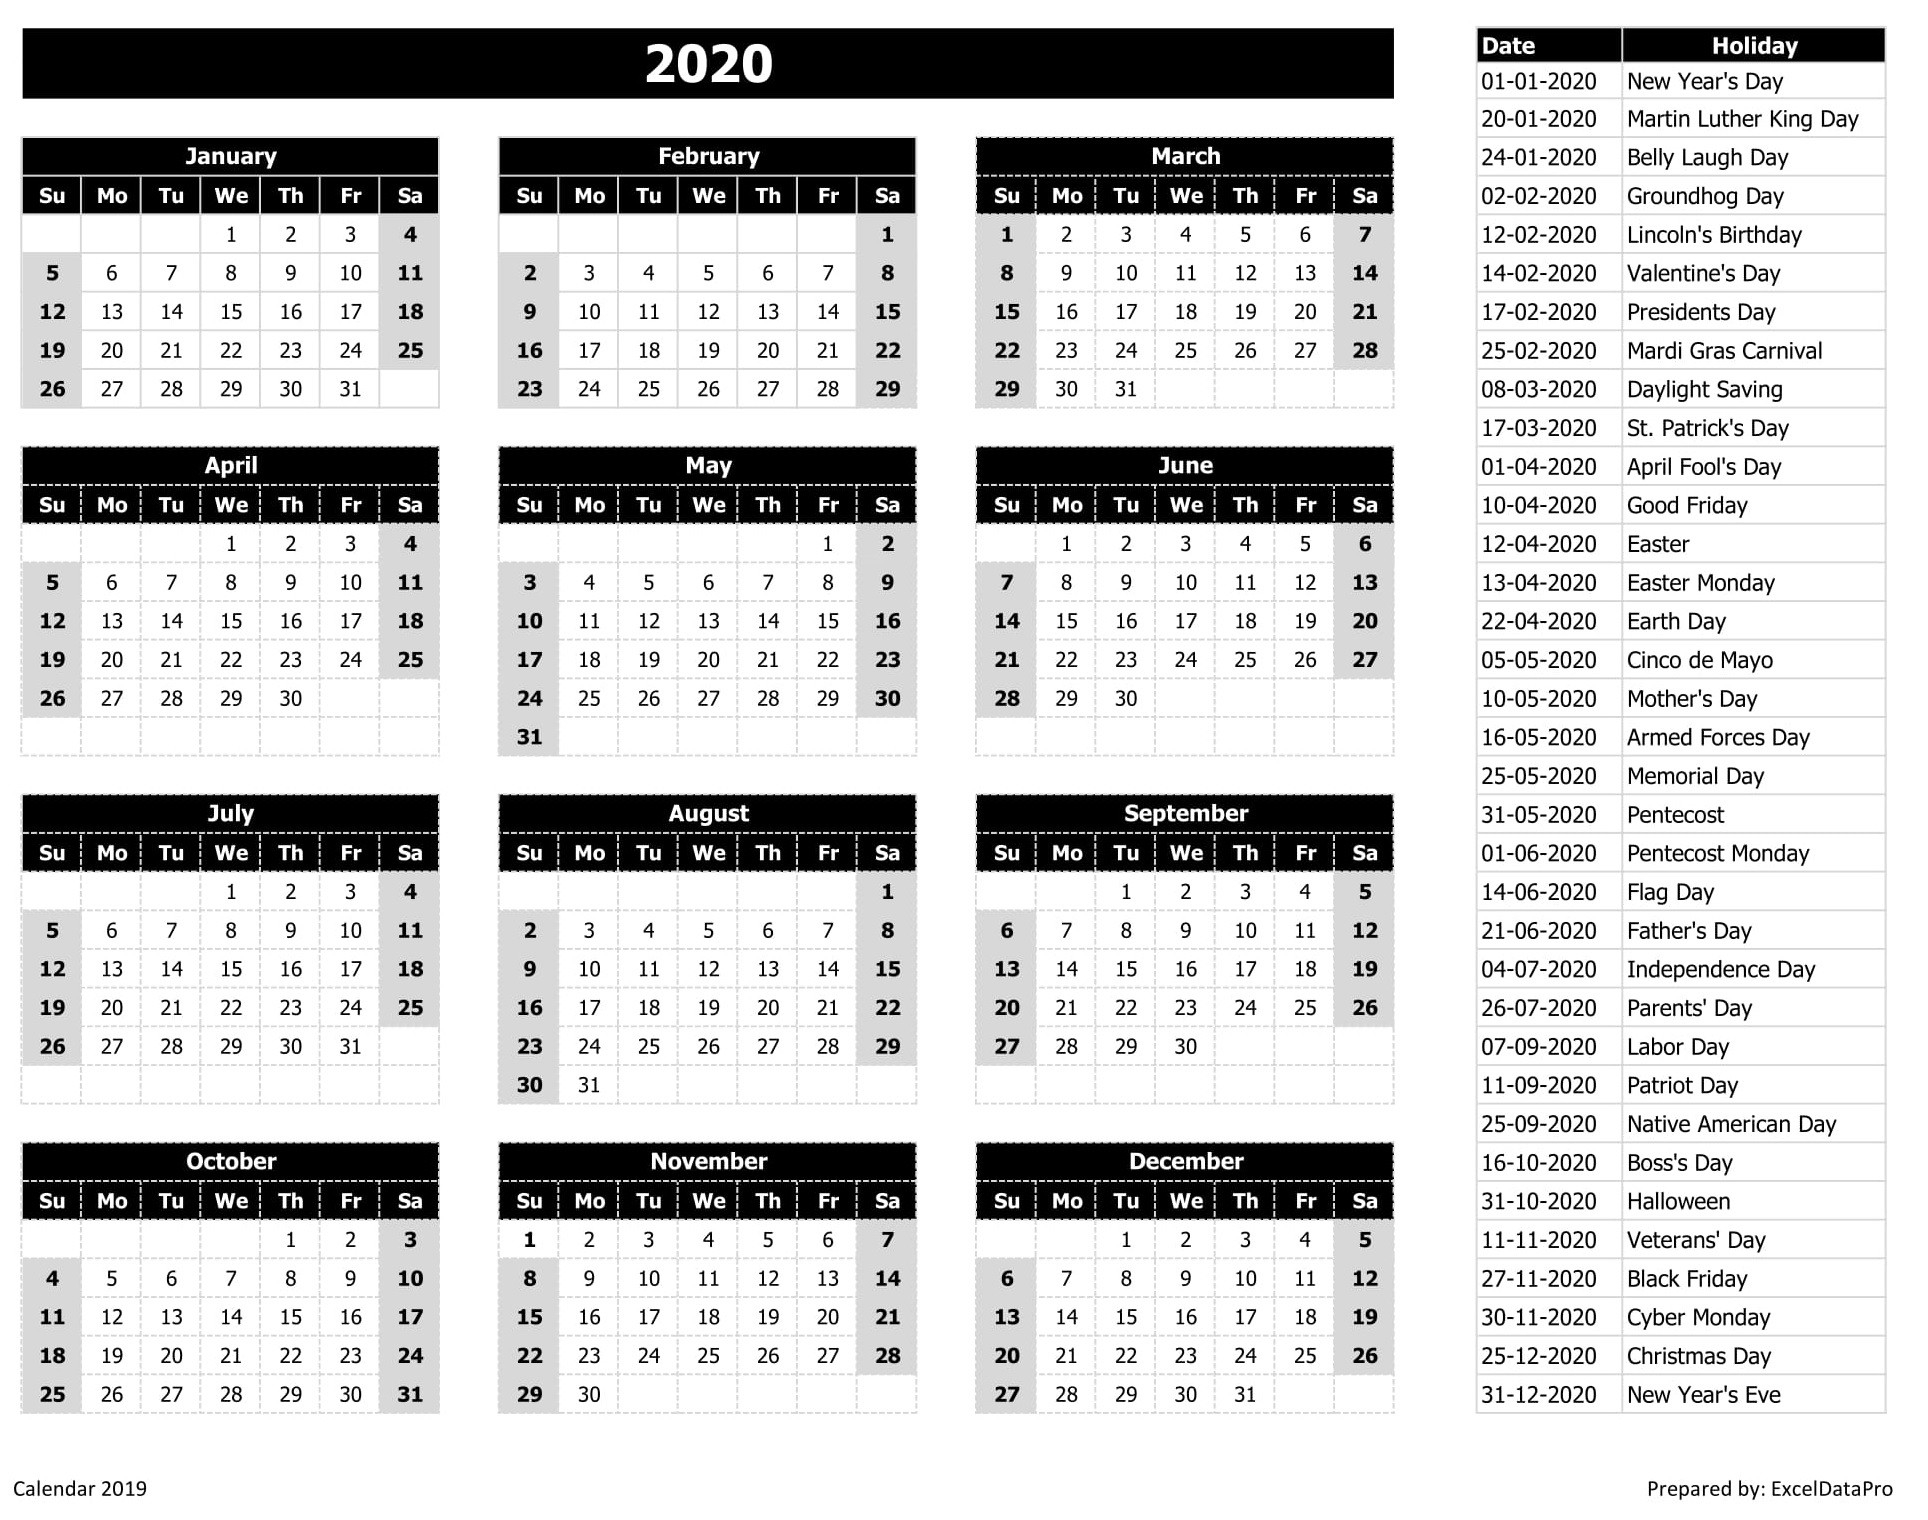 2020 Calendar Excel Templates, Printable Pdfs & Images-2020 Holidays Printable List